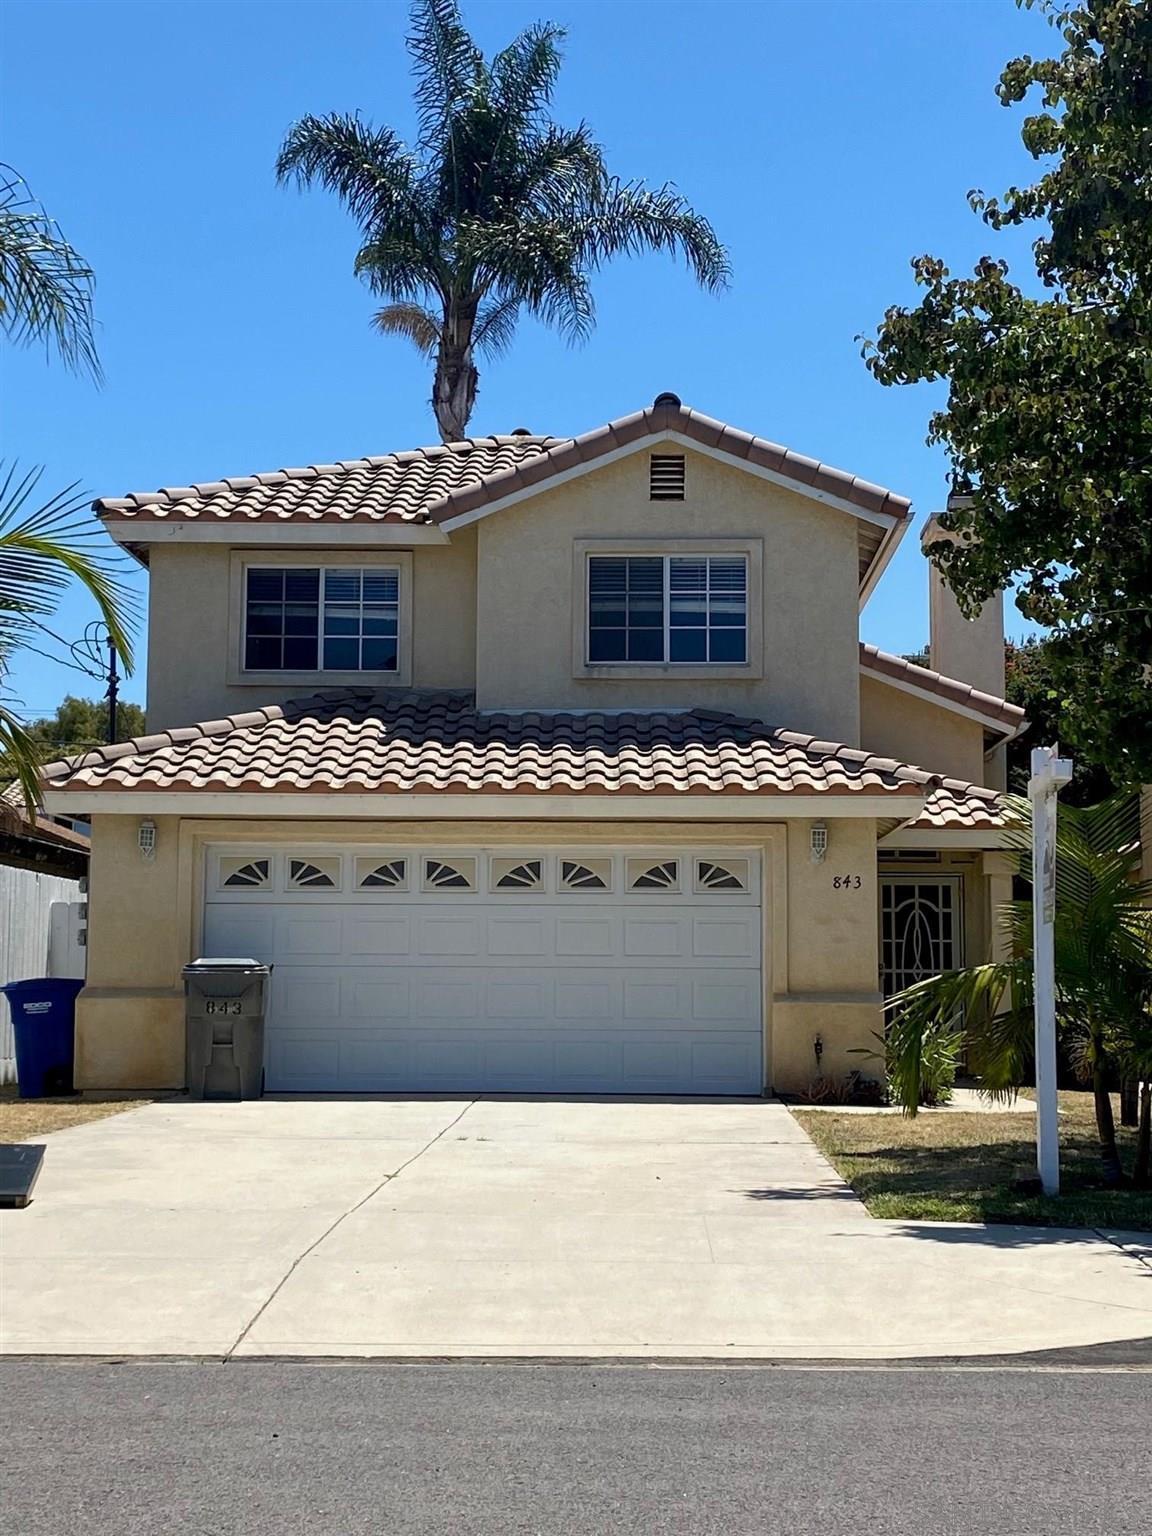 843 Emory Street, Imperial Beach, CA 91932